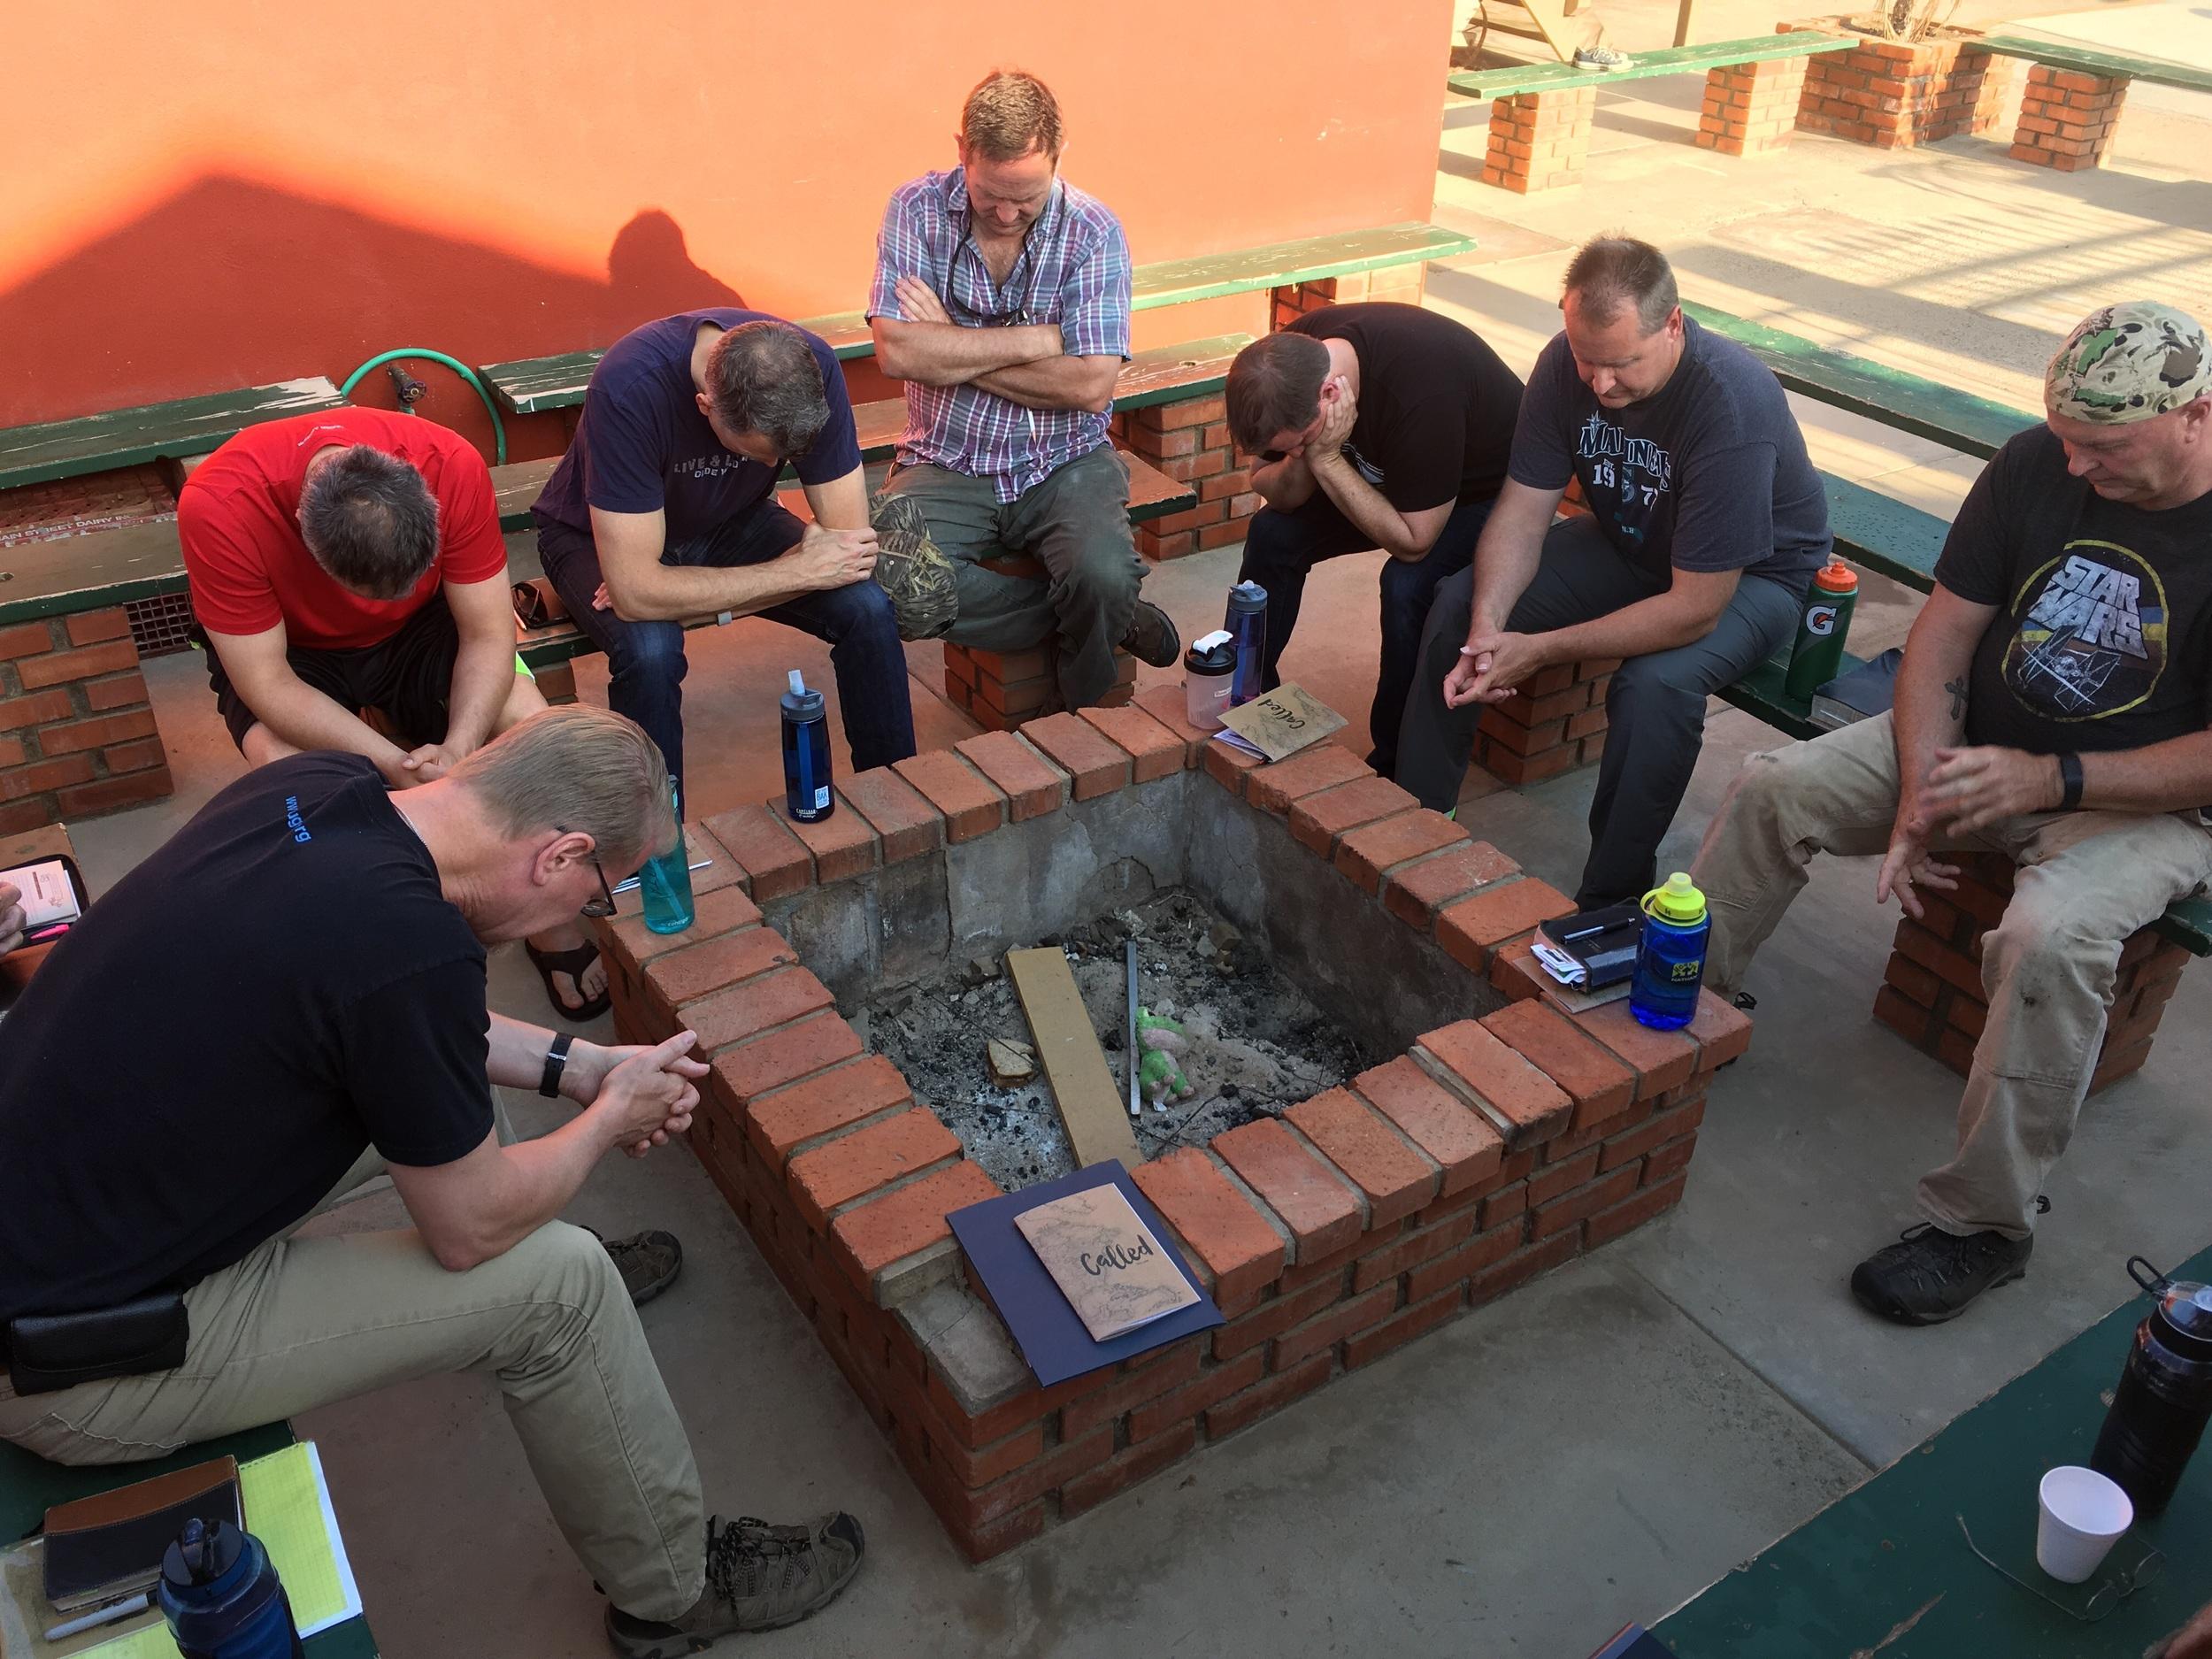 Men praying for the day